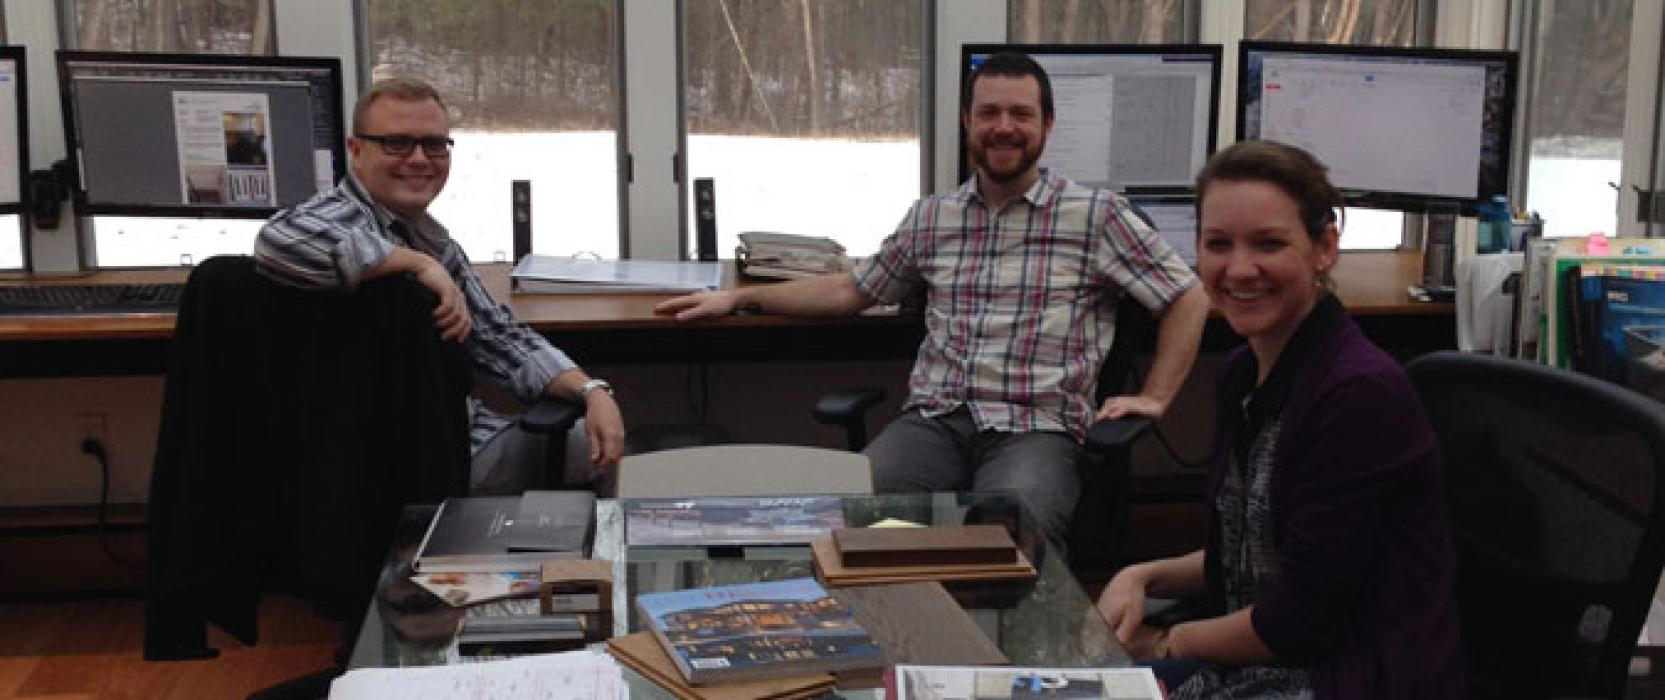 Office Space: Adams & Beasley's Retro Recording Studio